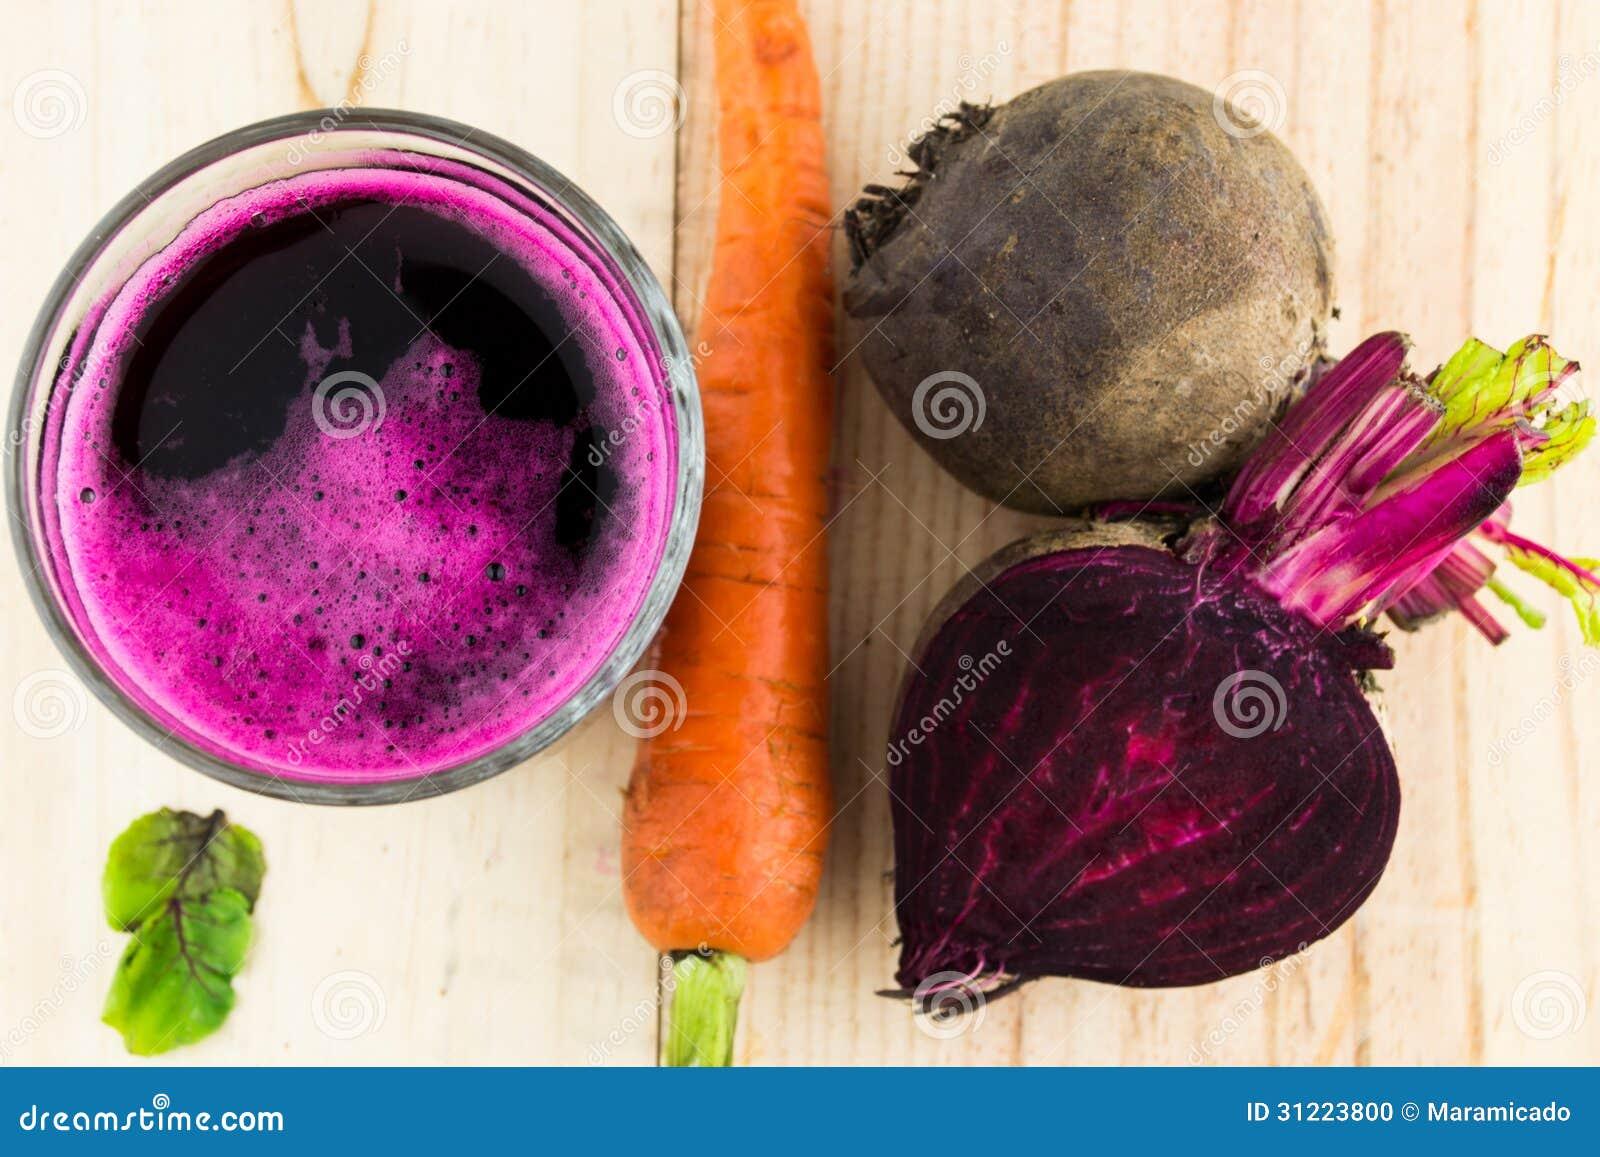 how to make fresh beet juice